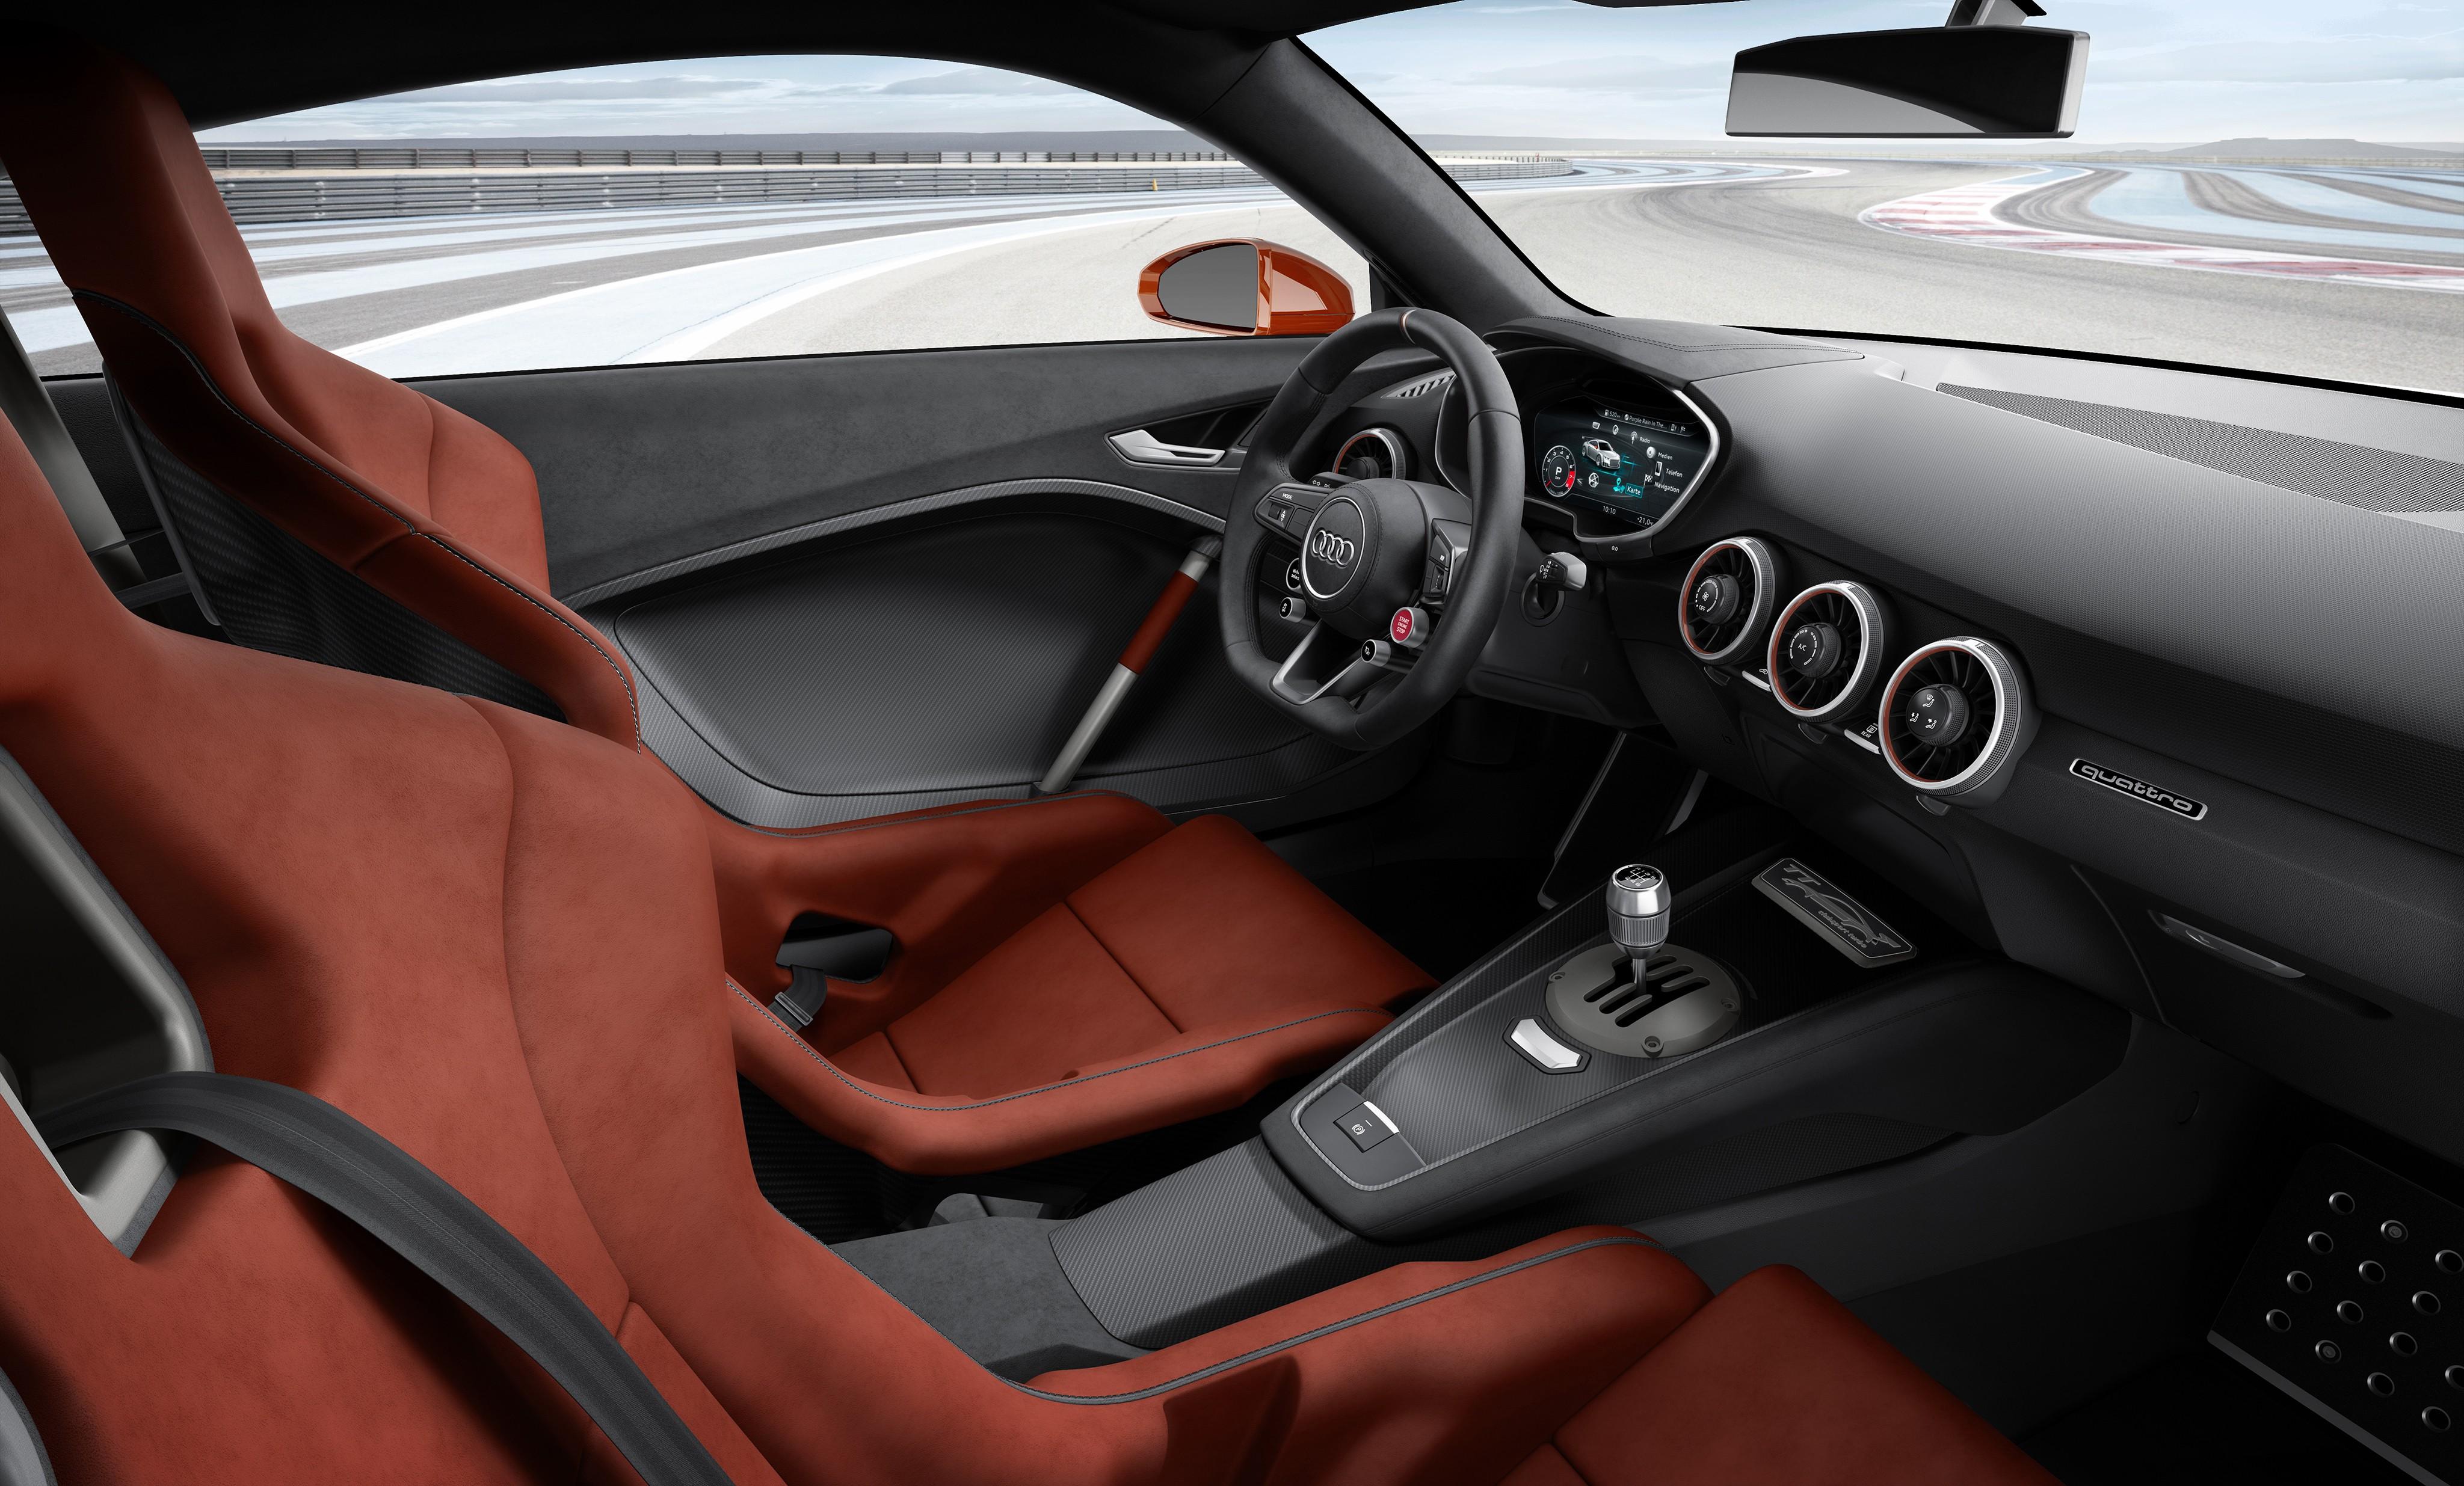 wallpaper audi tt clubsport turbo concept audi sports car racing interior cars bikes 7495. Black Bedroom Furniture Sets. Home Design Ideas